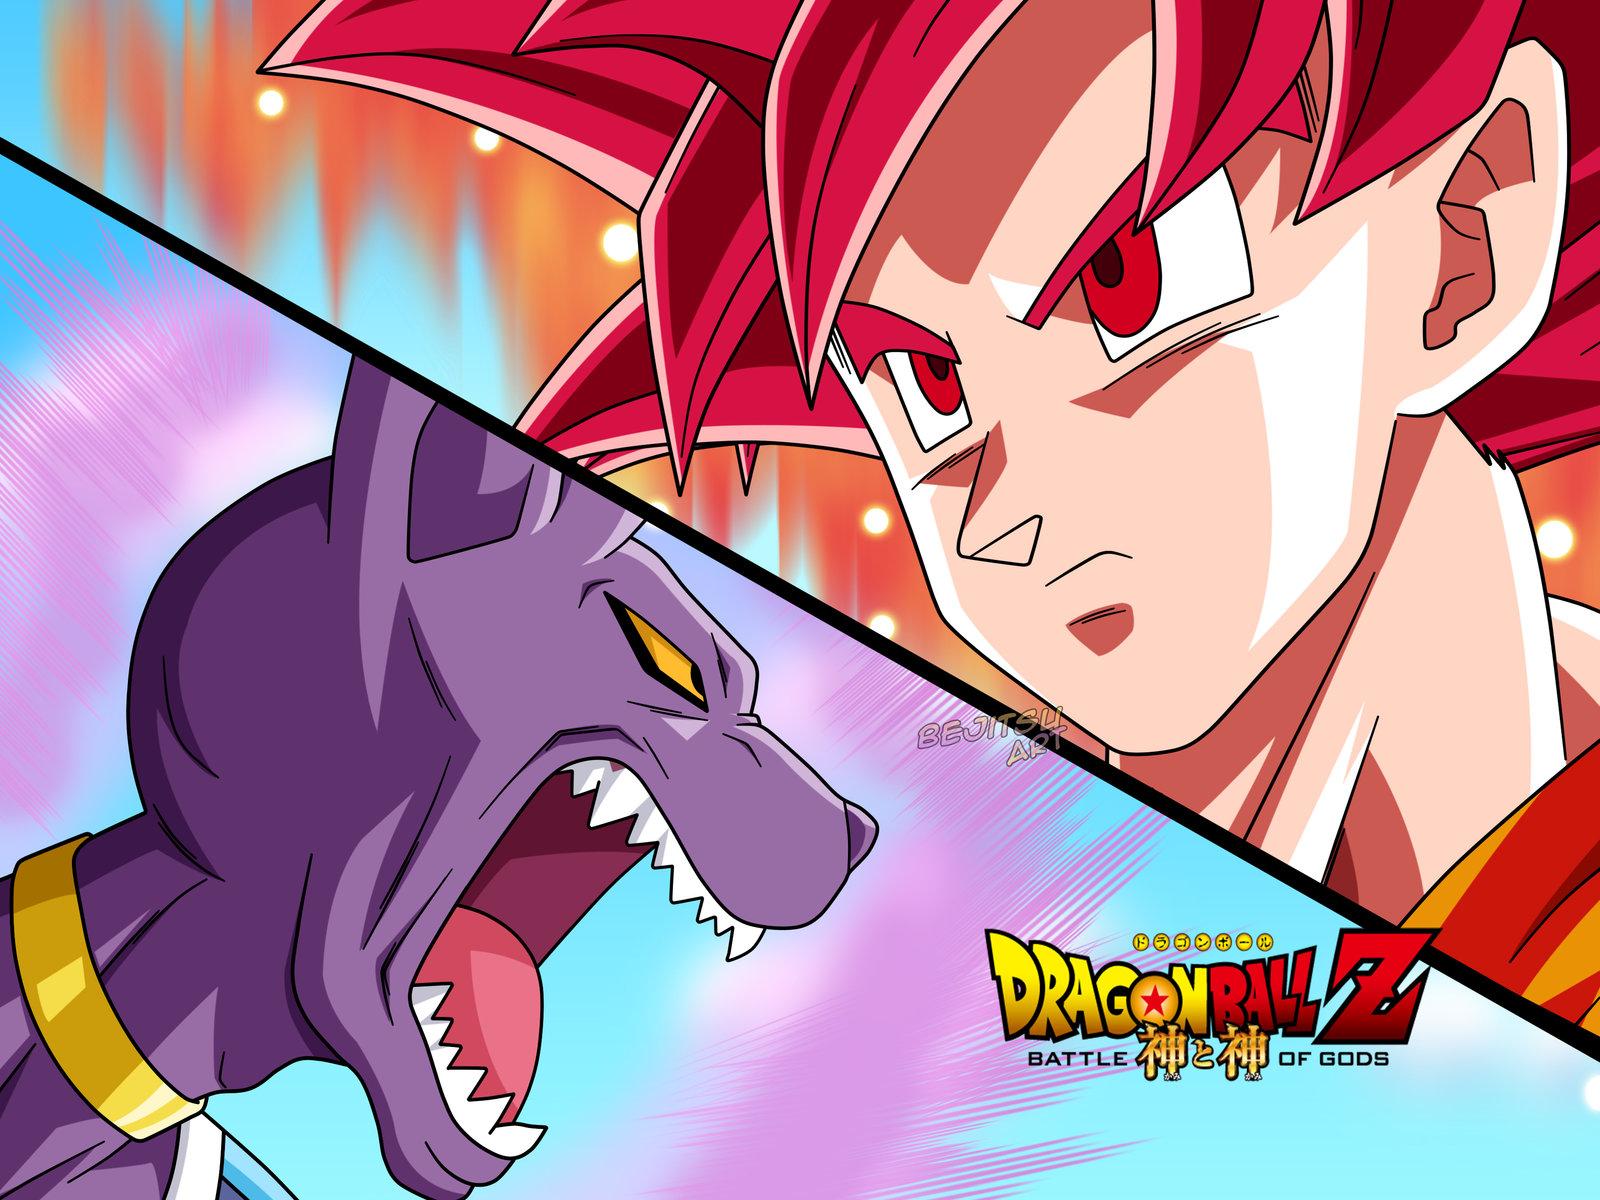 Goku V S Bills Dragon Ball Z Wallpaper 35991607 Fanpop